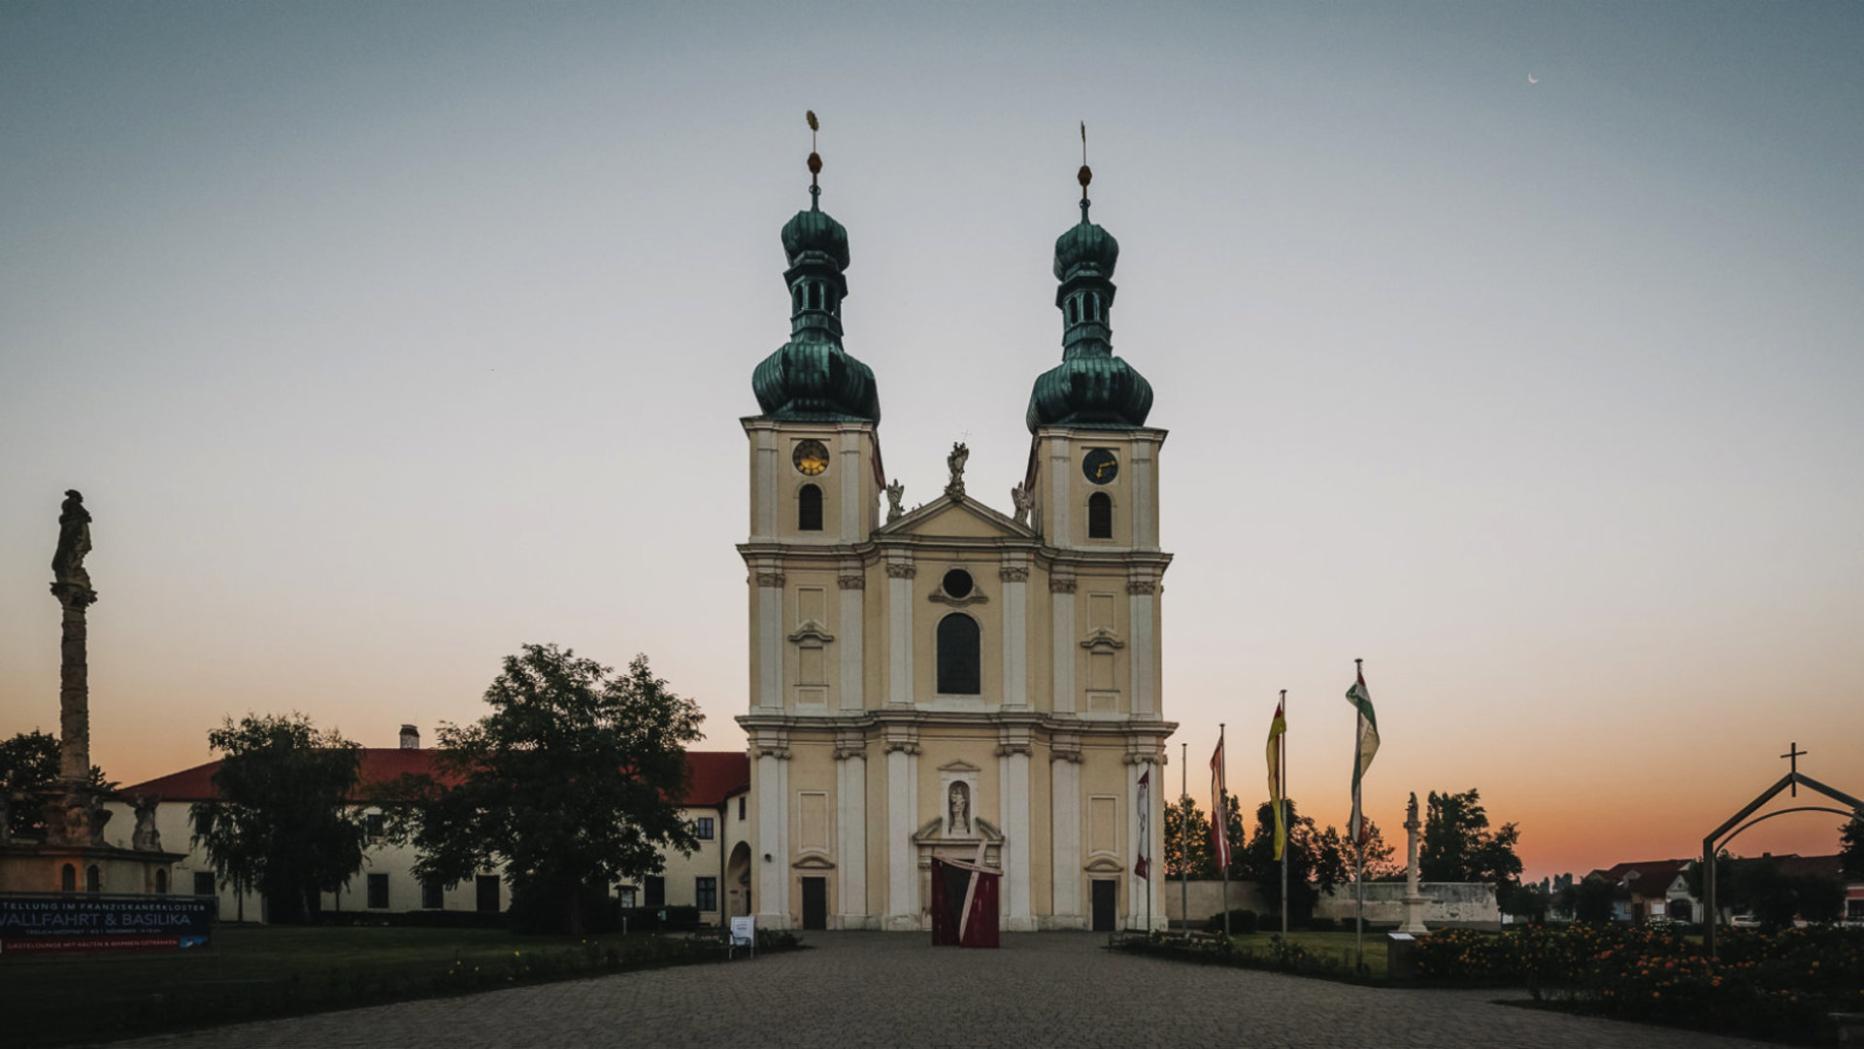 Partnersuche Fr Singles Ohne Niveau Frauenkirchen - Swiss